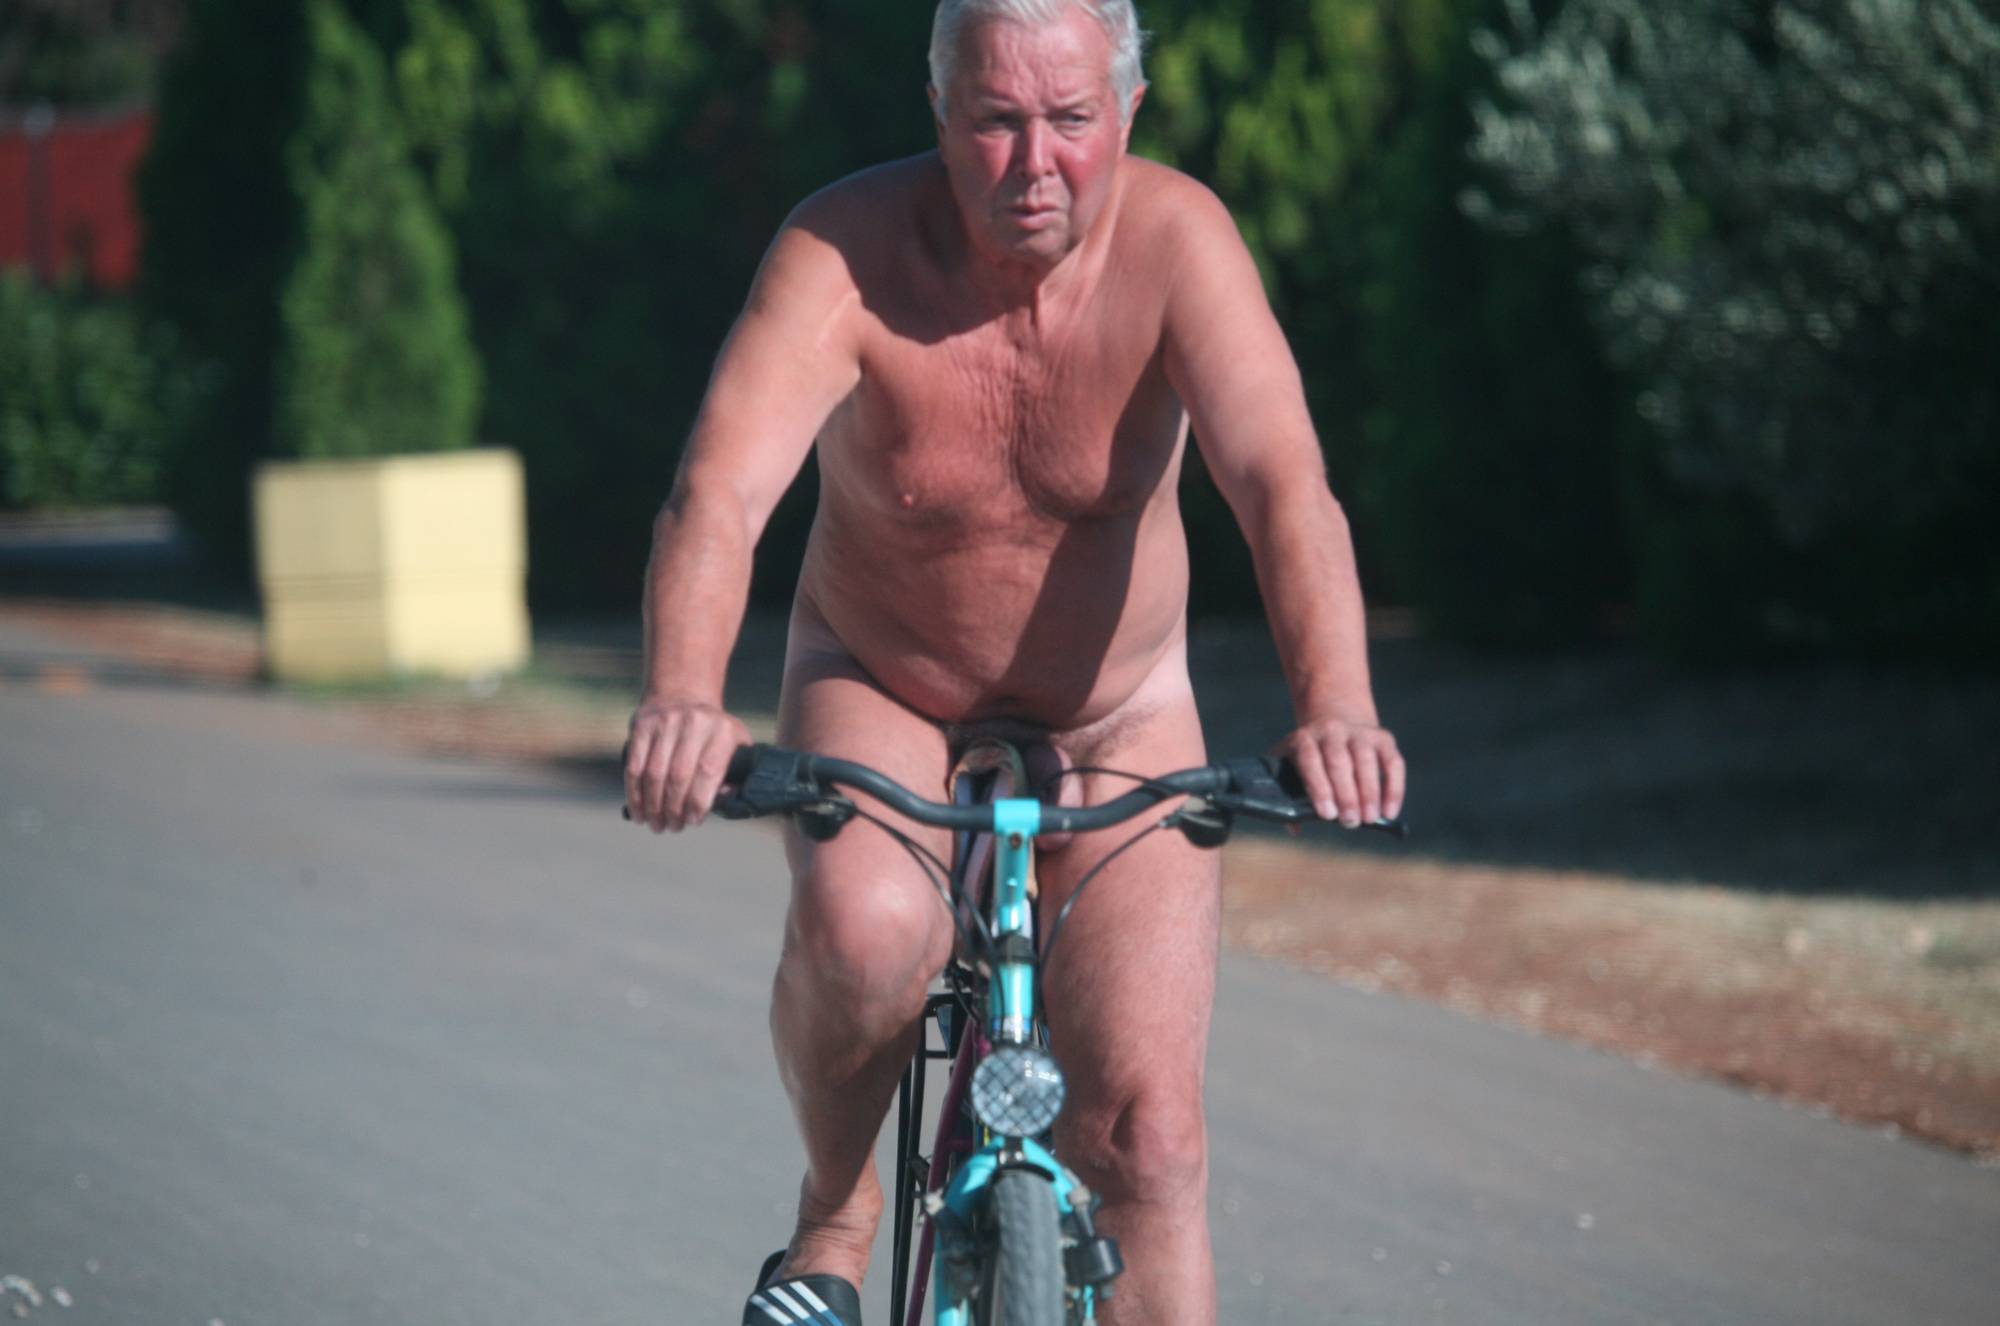 Pure Nudism Images-Nora FKK Road Park Biking - 1